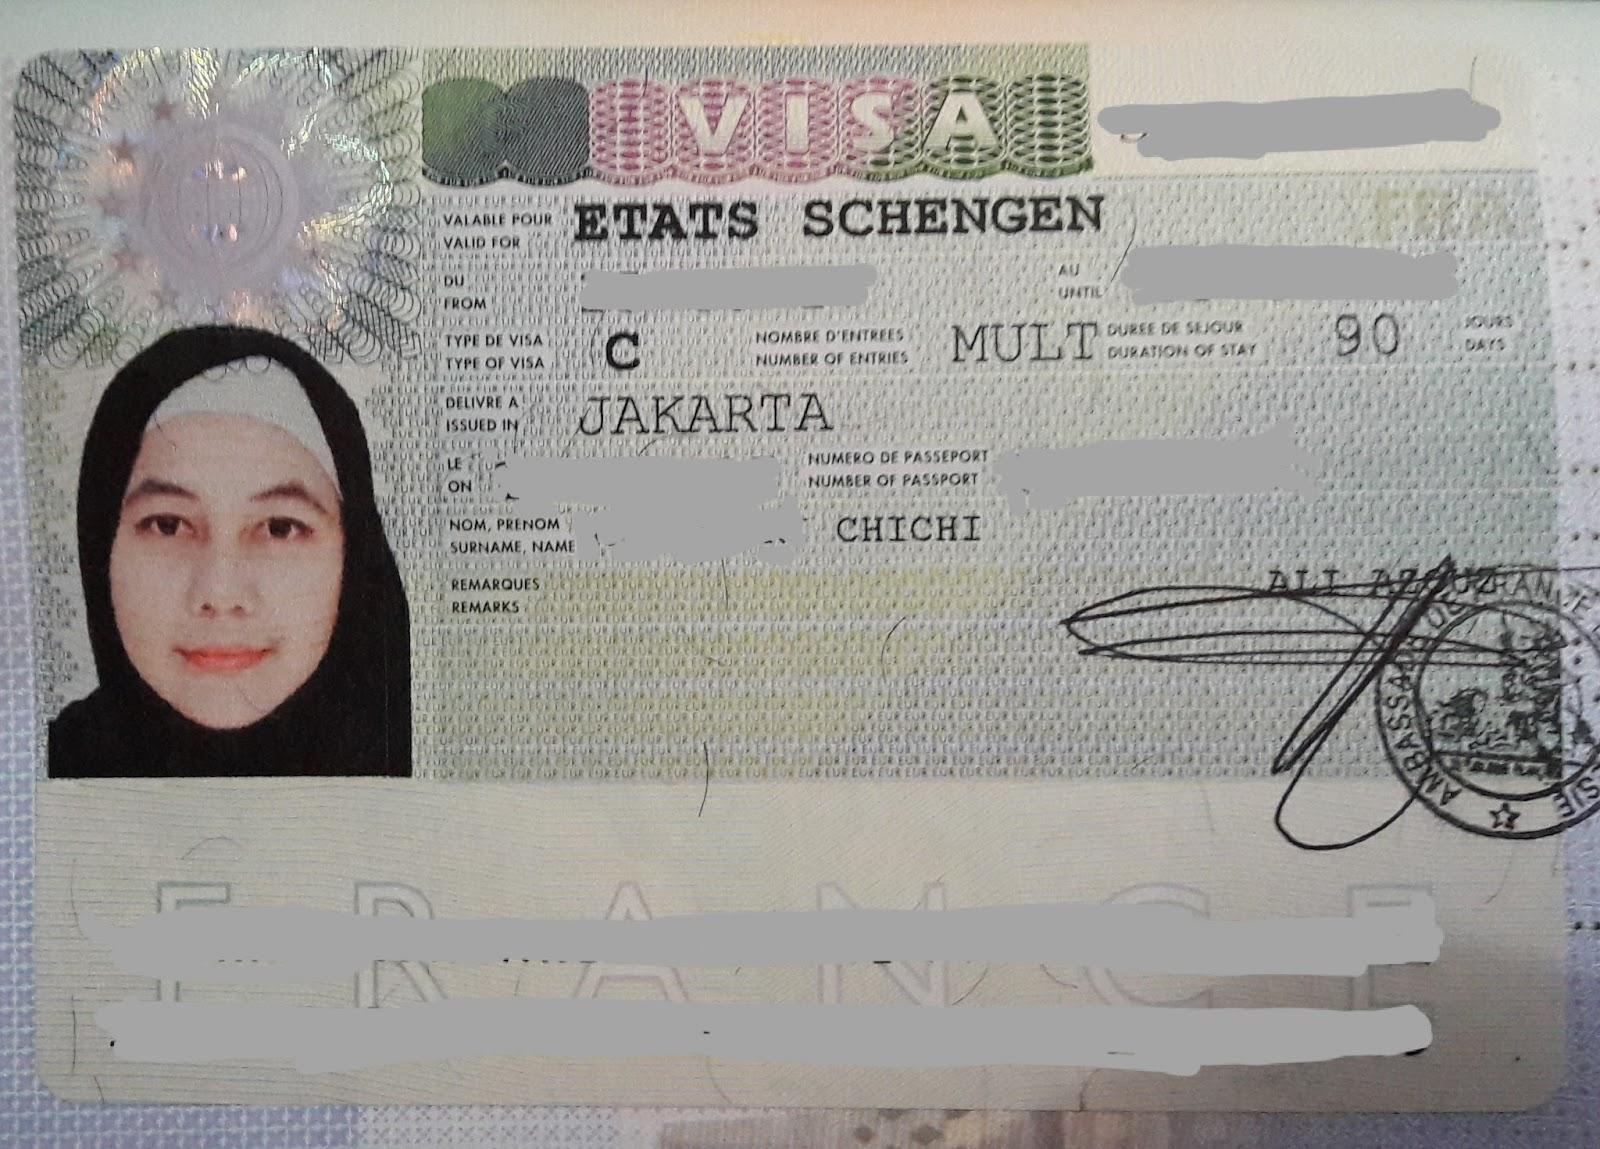 The Journey Of Chimin Pengurusan Visa Schengen Untuk Perjalanan Keliling Eropa 2017 Euro Trip 2017